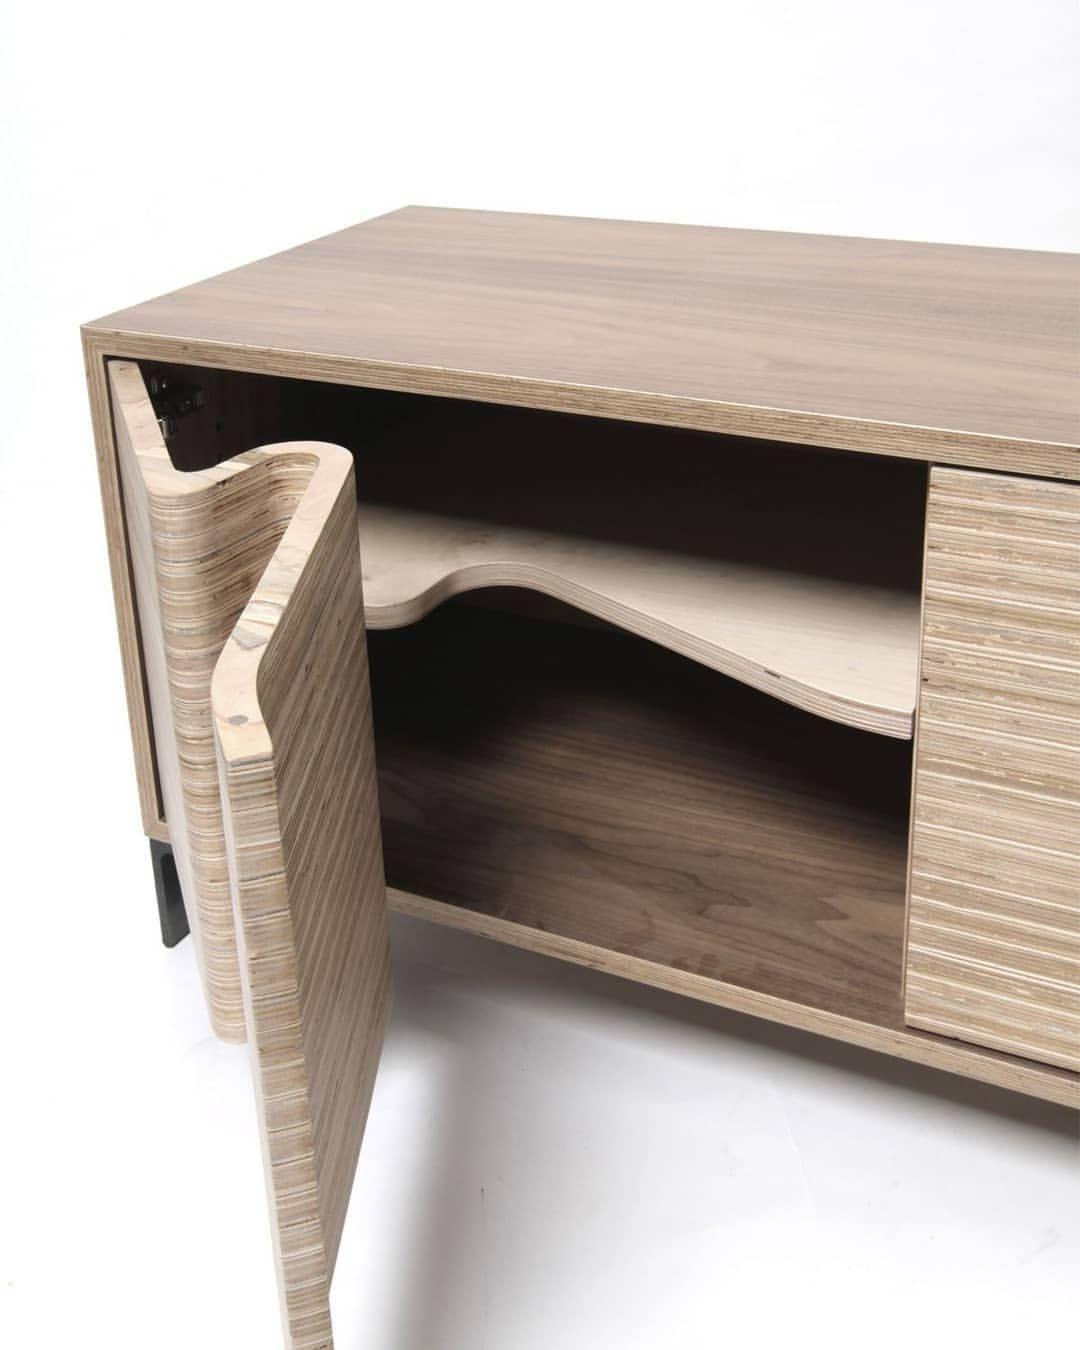 Furnituremaker Furnituredesign Handcrafted Dunsborough Woodworkingschool Woodworking Dovetails Wood Handcraft Bespokefurniture Wood Design Plywood Furniture Furniture